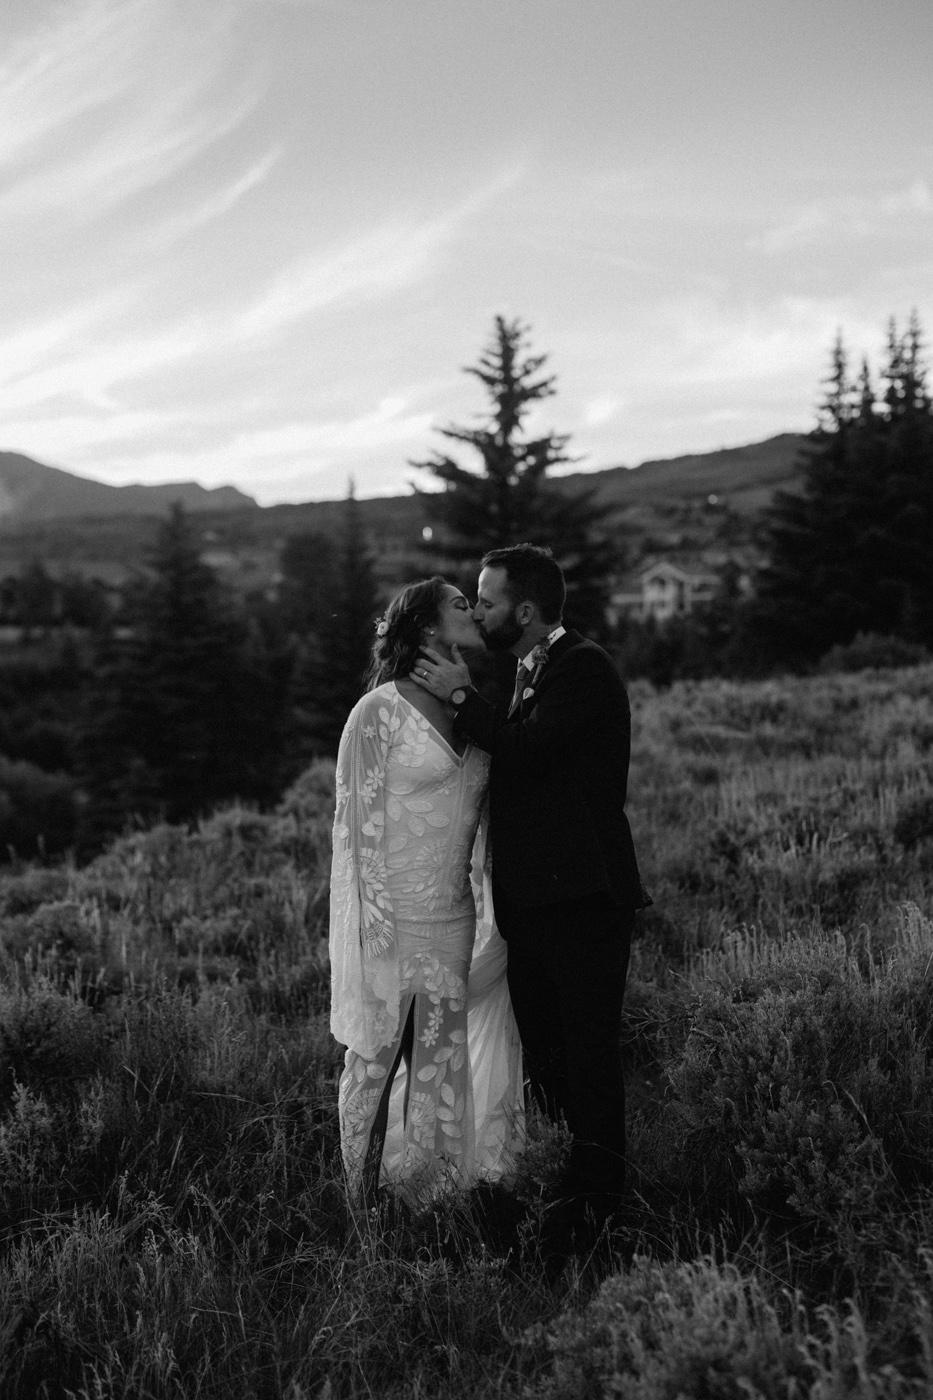 woods-walk-trail-crested-butte-colorado-wedding-134.jpg